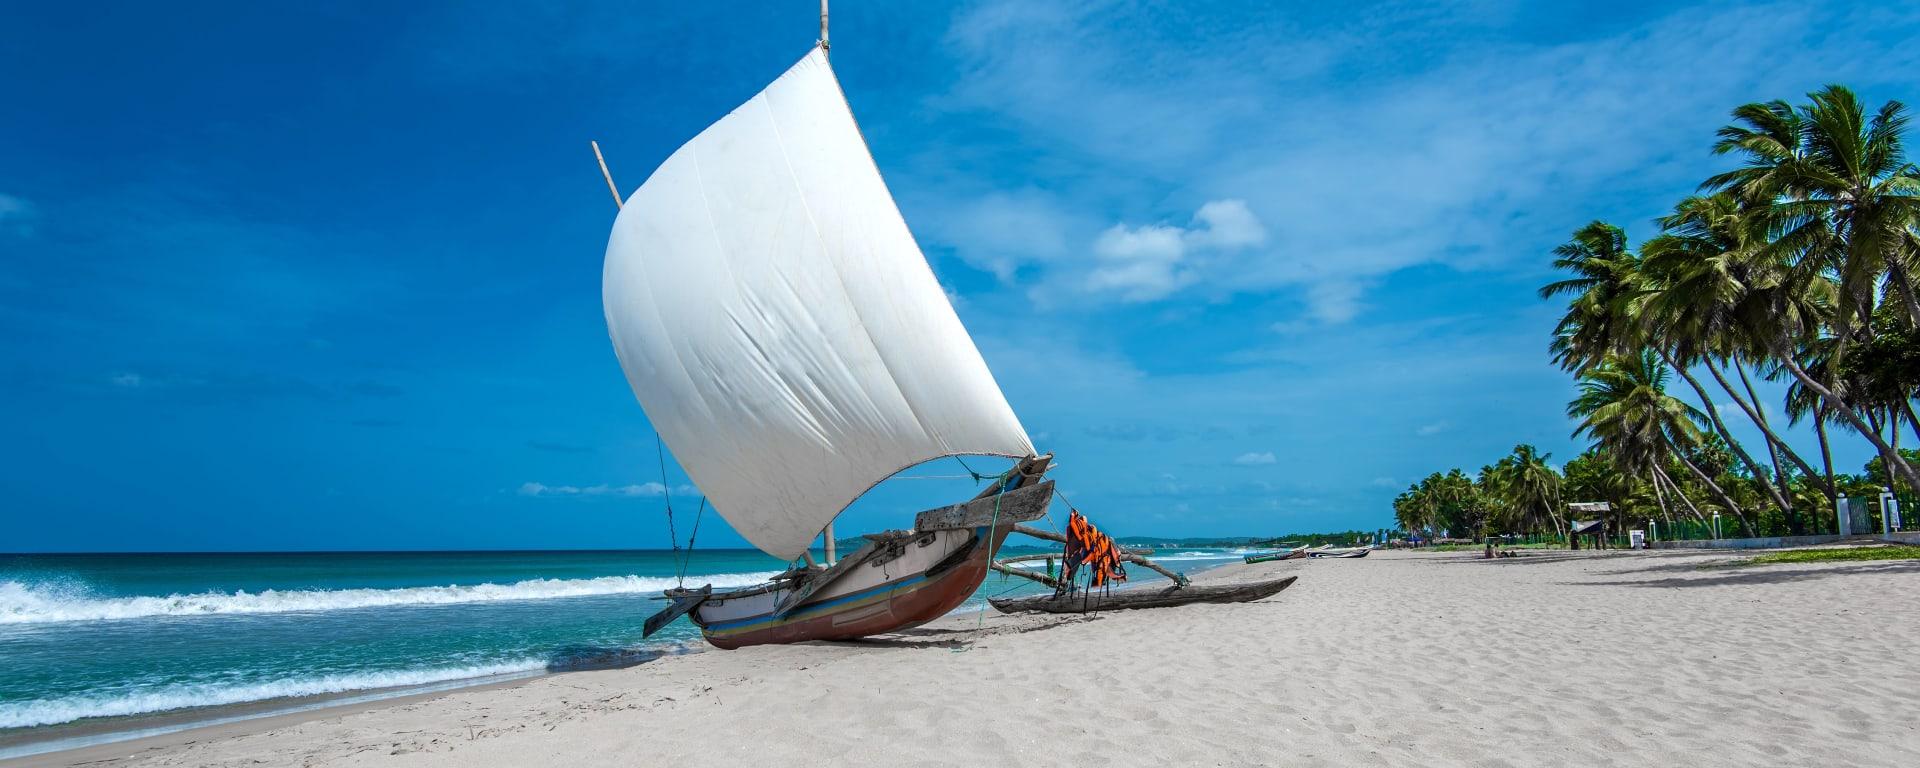 Sri Lanka entdecken mit Tischler Reisen: Sri Lanka Strand Trincomalee